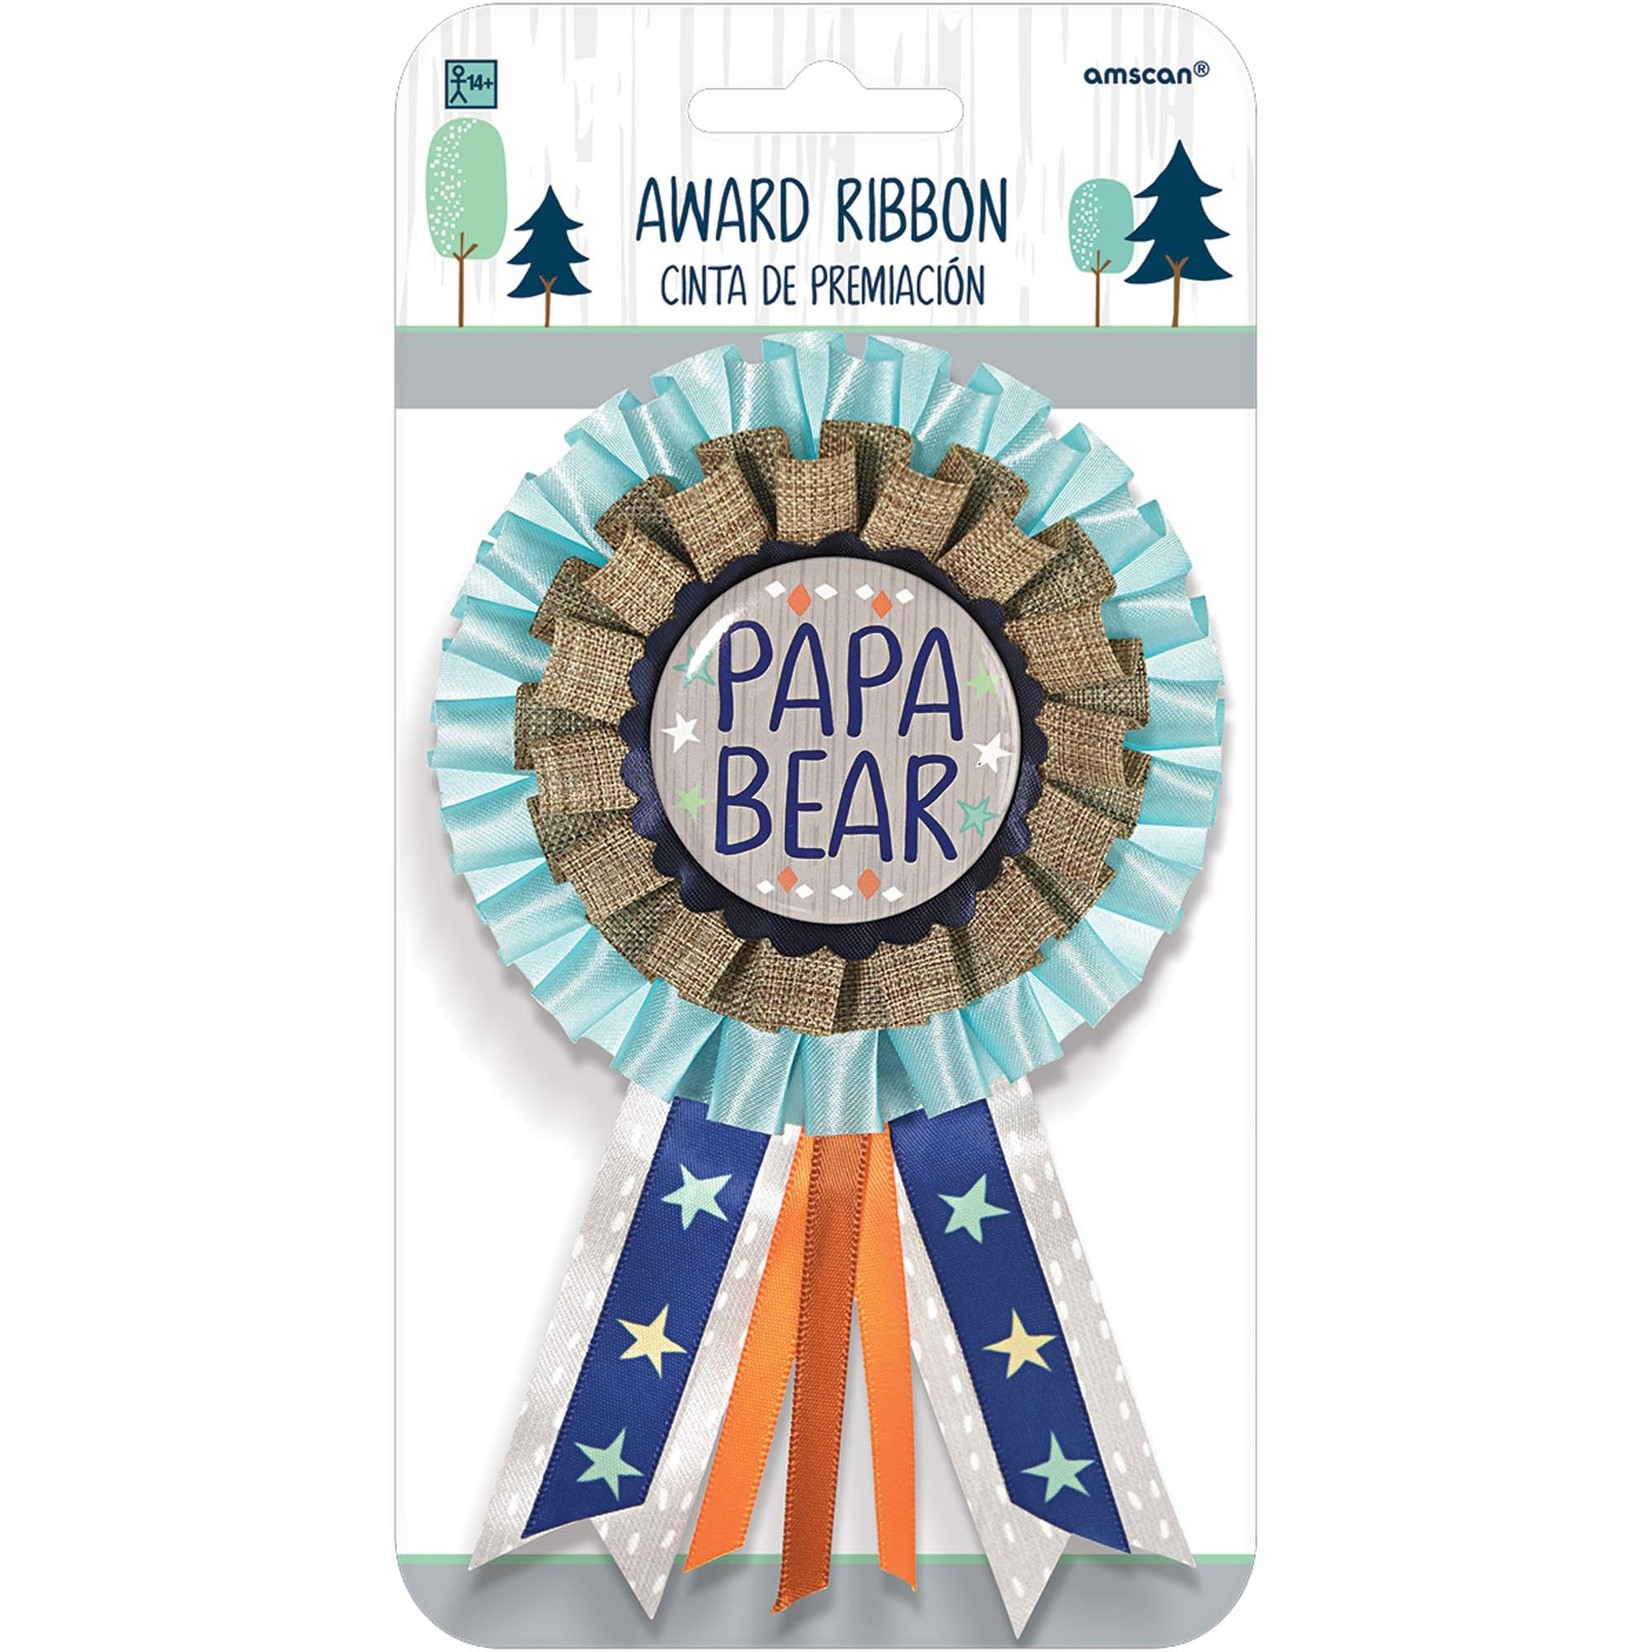 Award Ribbon-Papa Bear- Bear-ly Wait